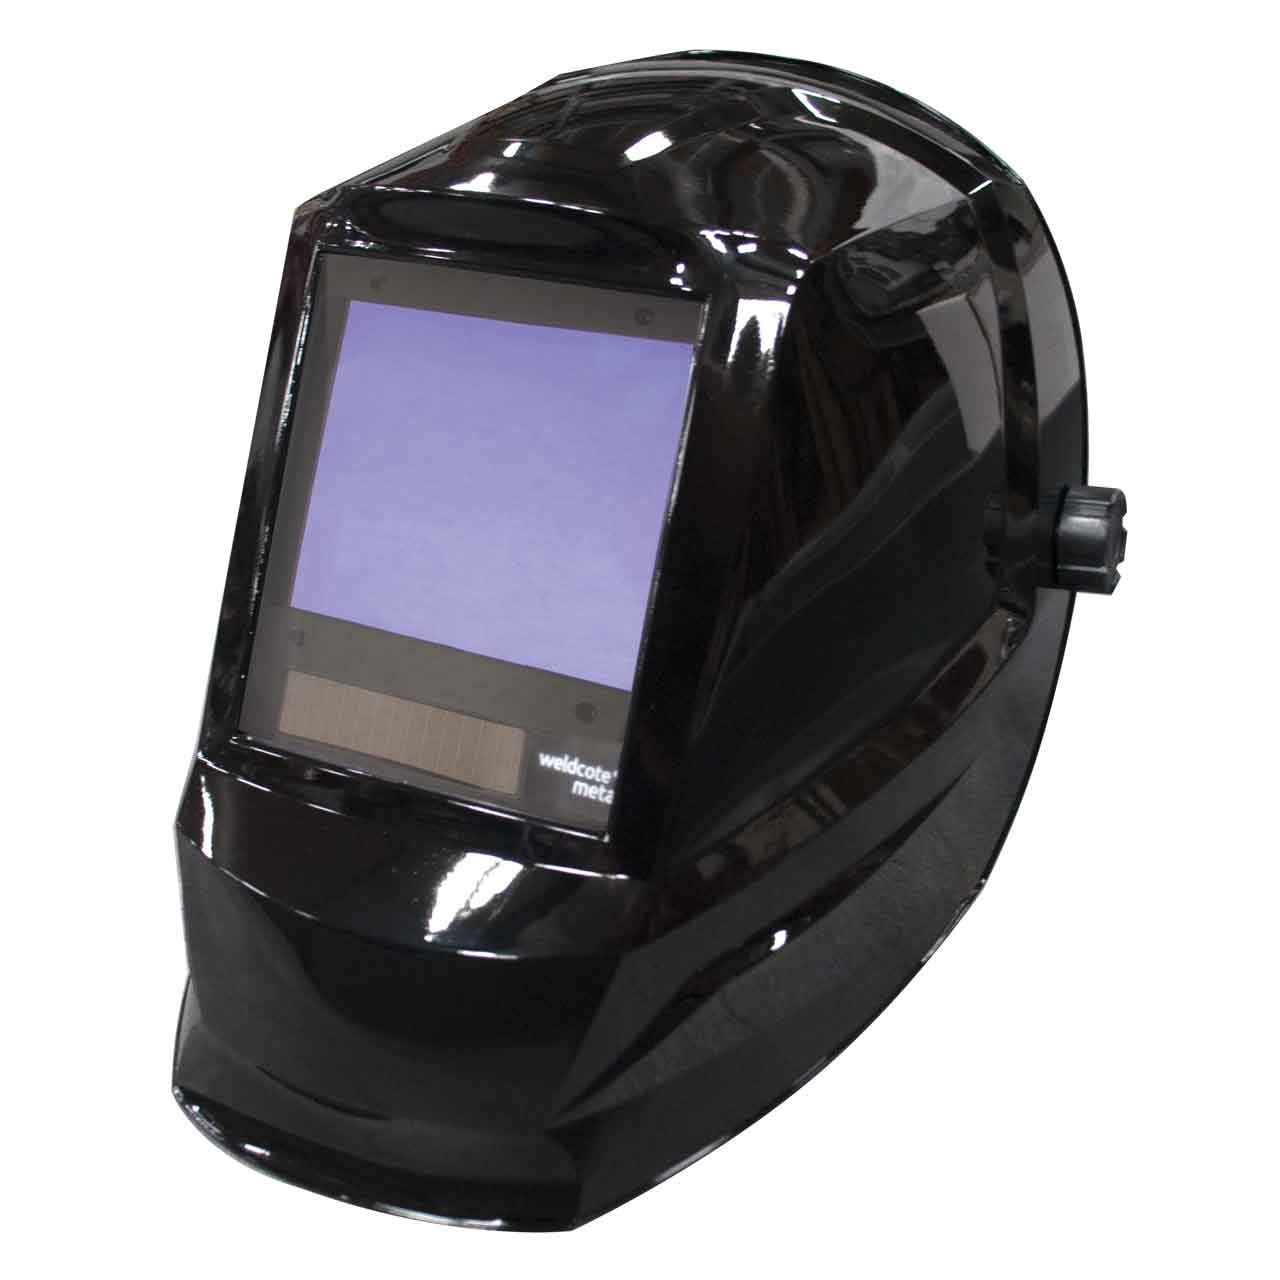 Weldcote Metals Ultraview Plus True Color Digital Auto Darkening Weldi by Weldcote Metals